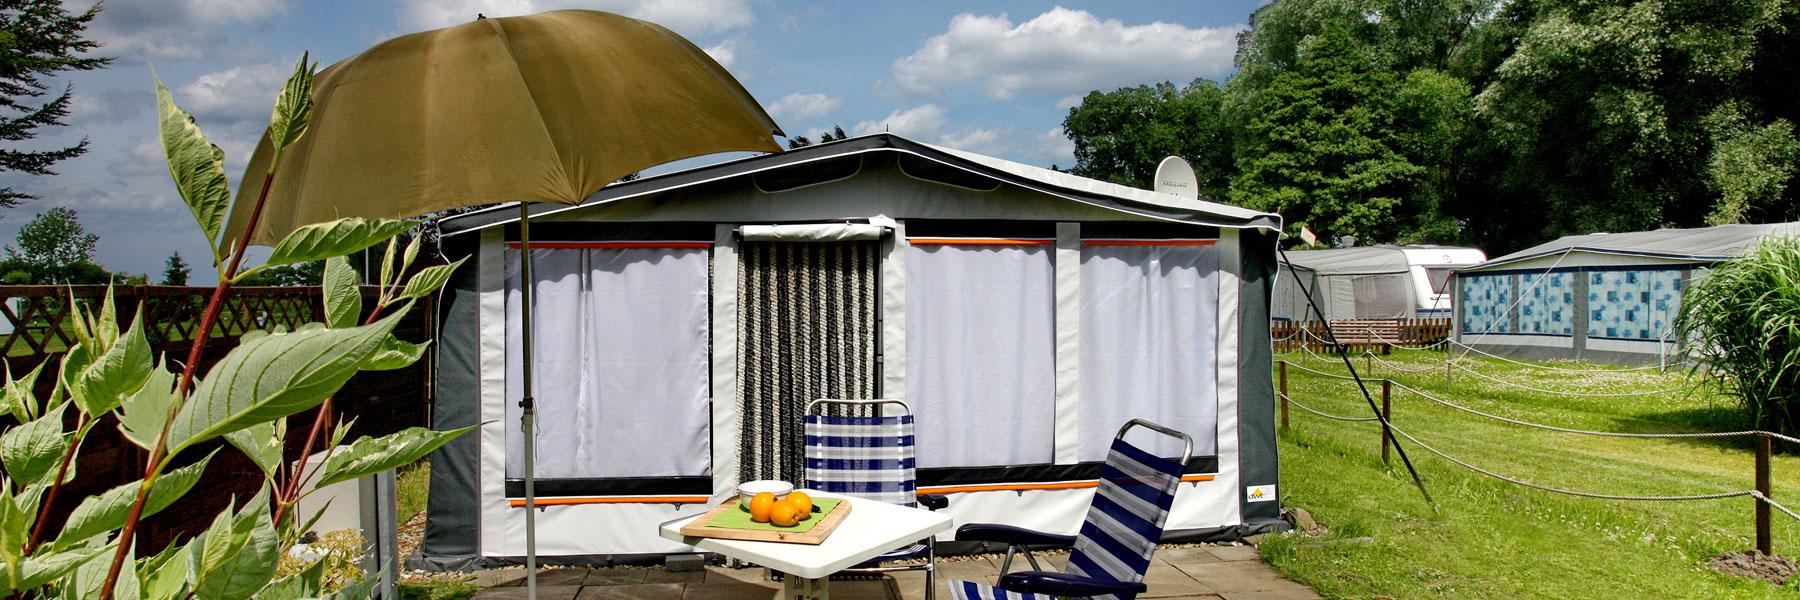 Wohnwagen - Campingplatz Niendorf